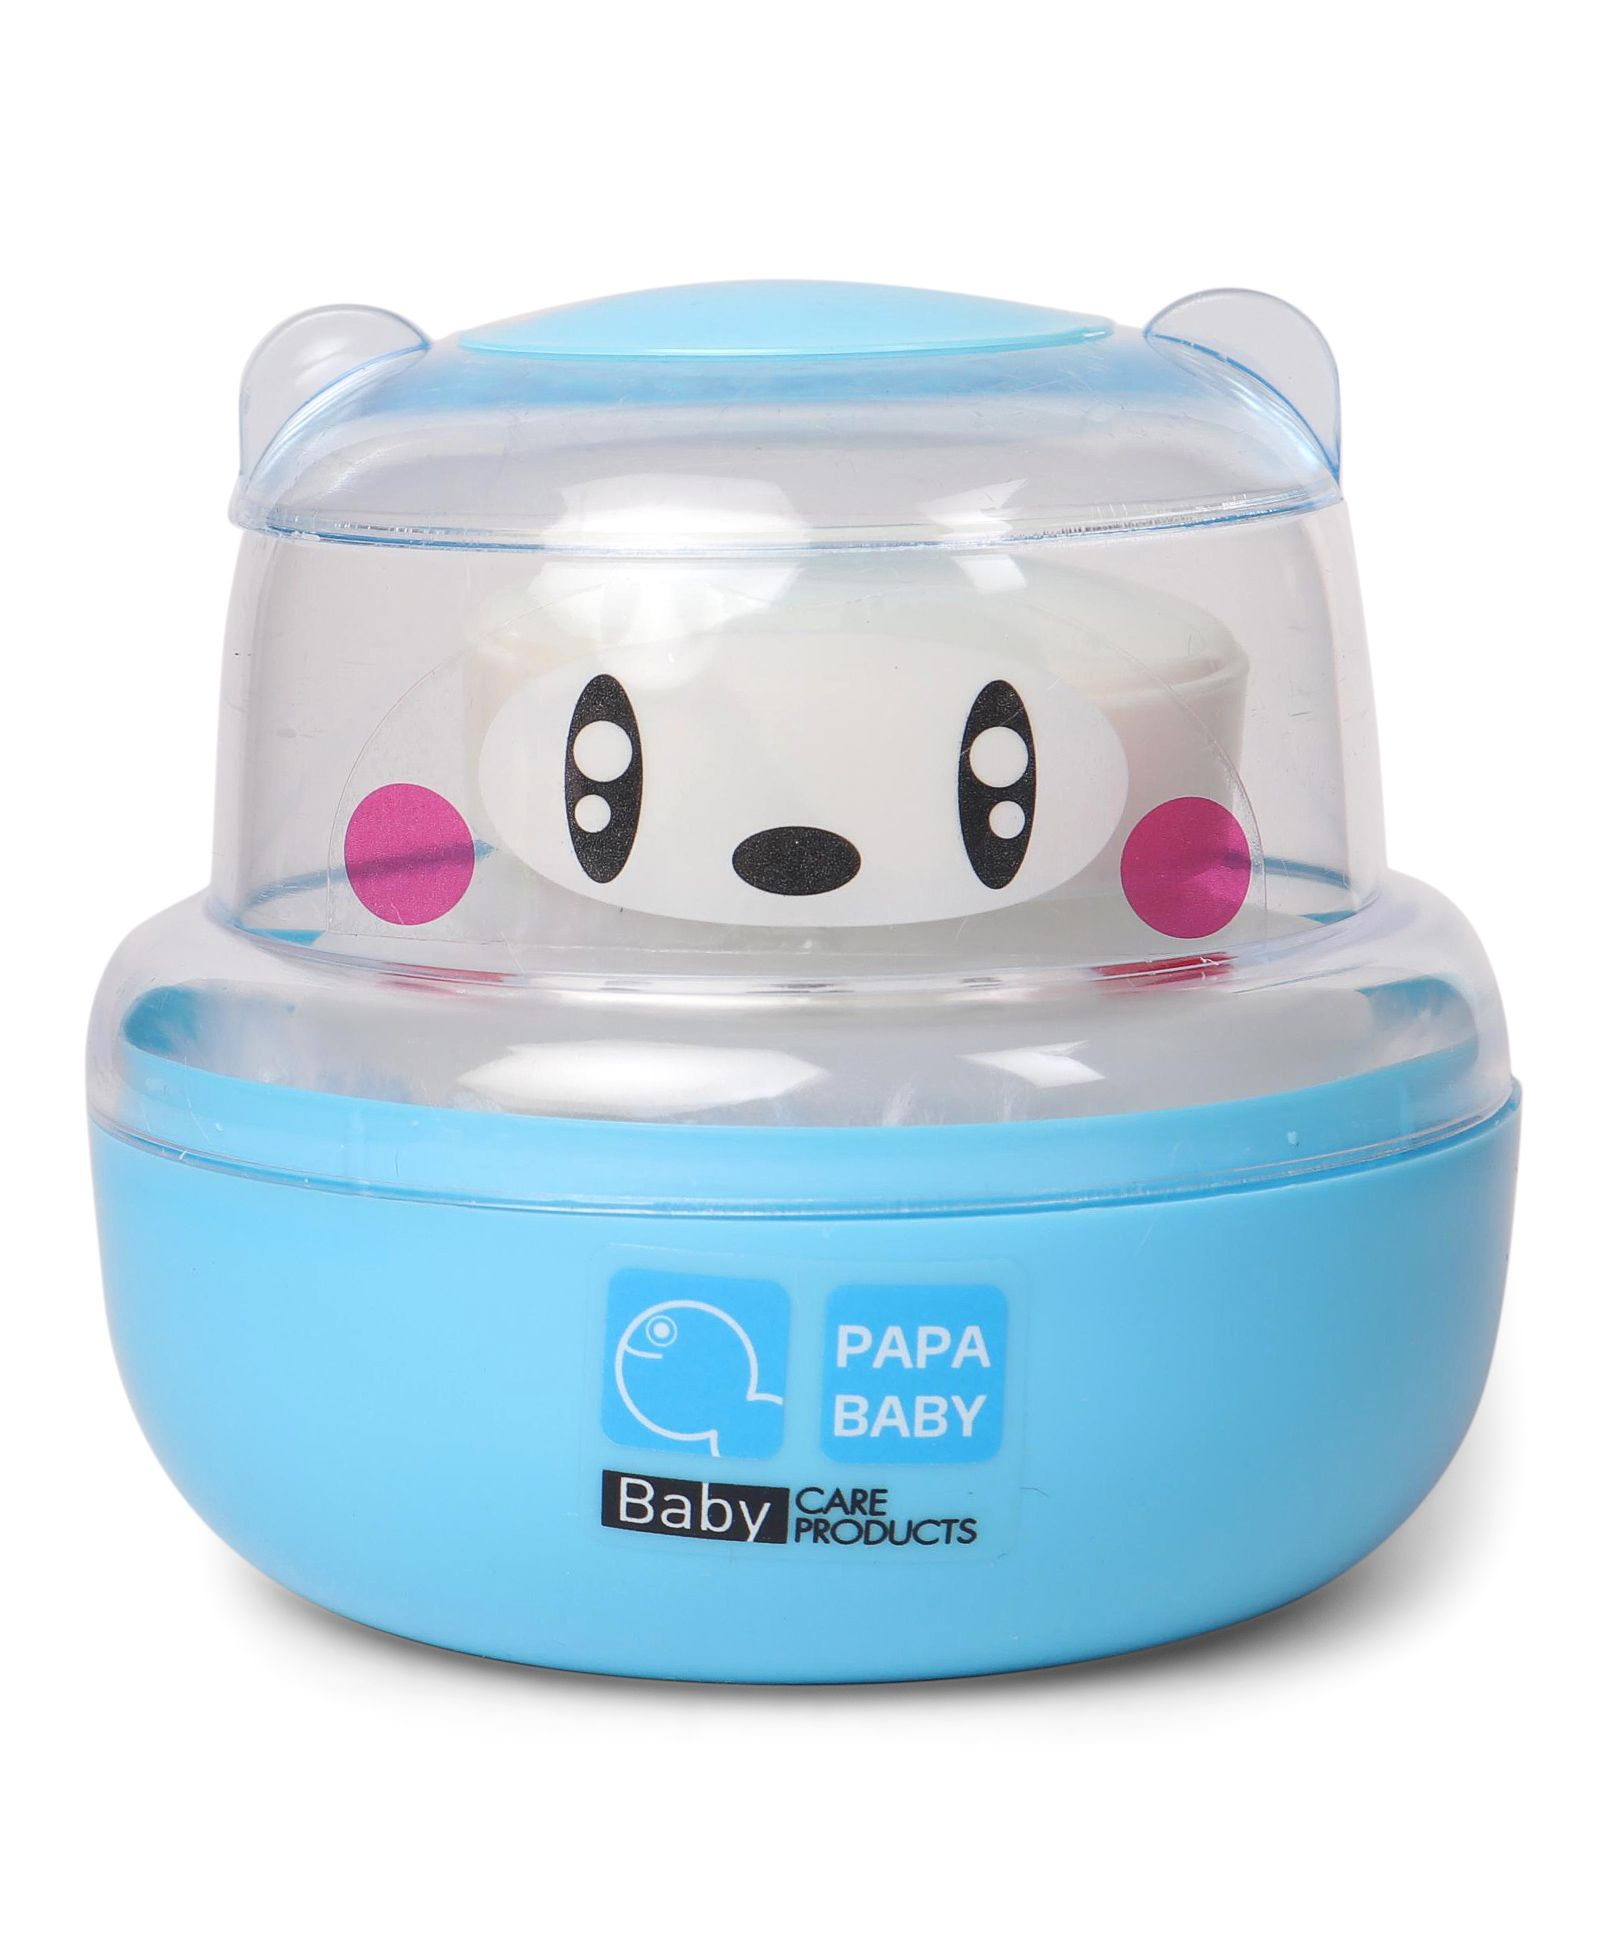 Papa Baby Powder Puff Panda Face Design - Blue